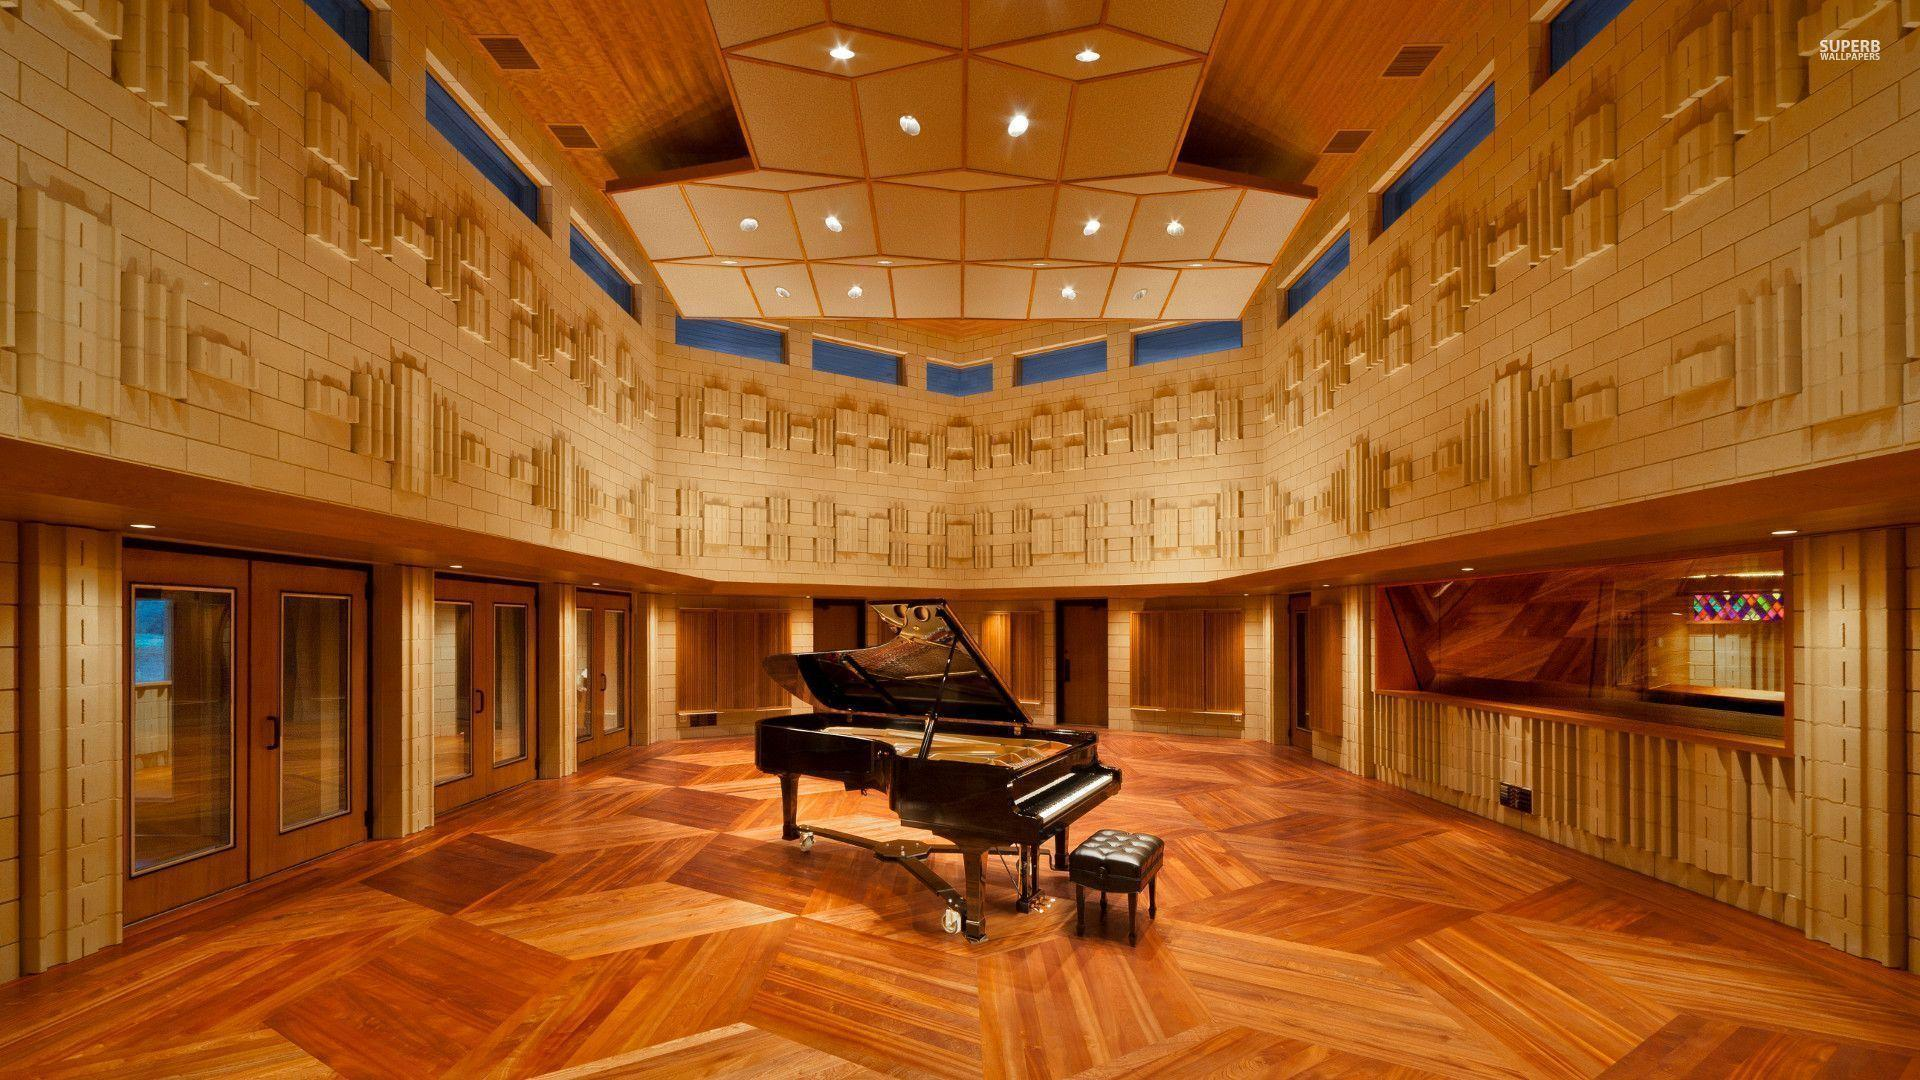 Recording studio wallpapers wallpaper cave for Room design hd wallpaper